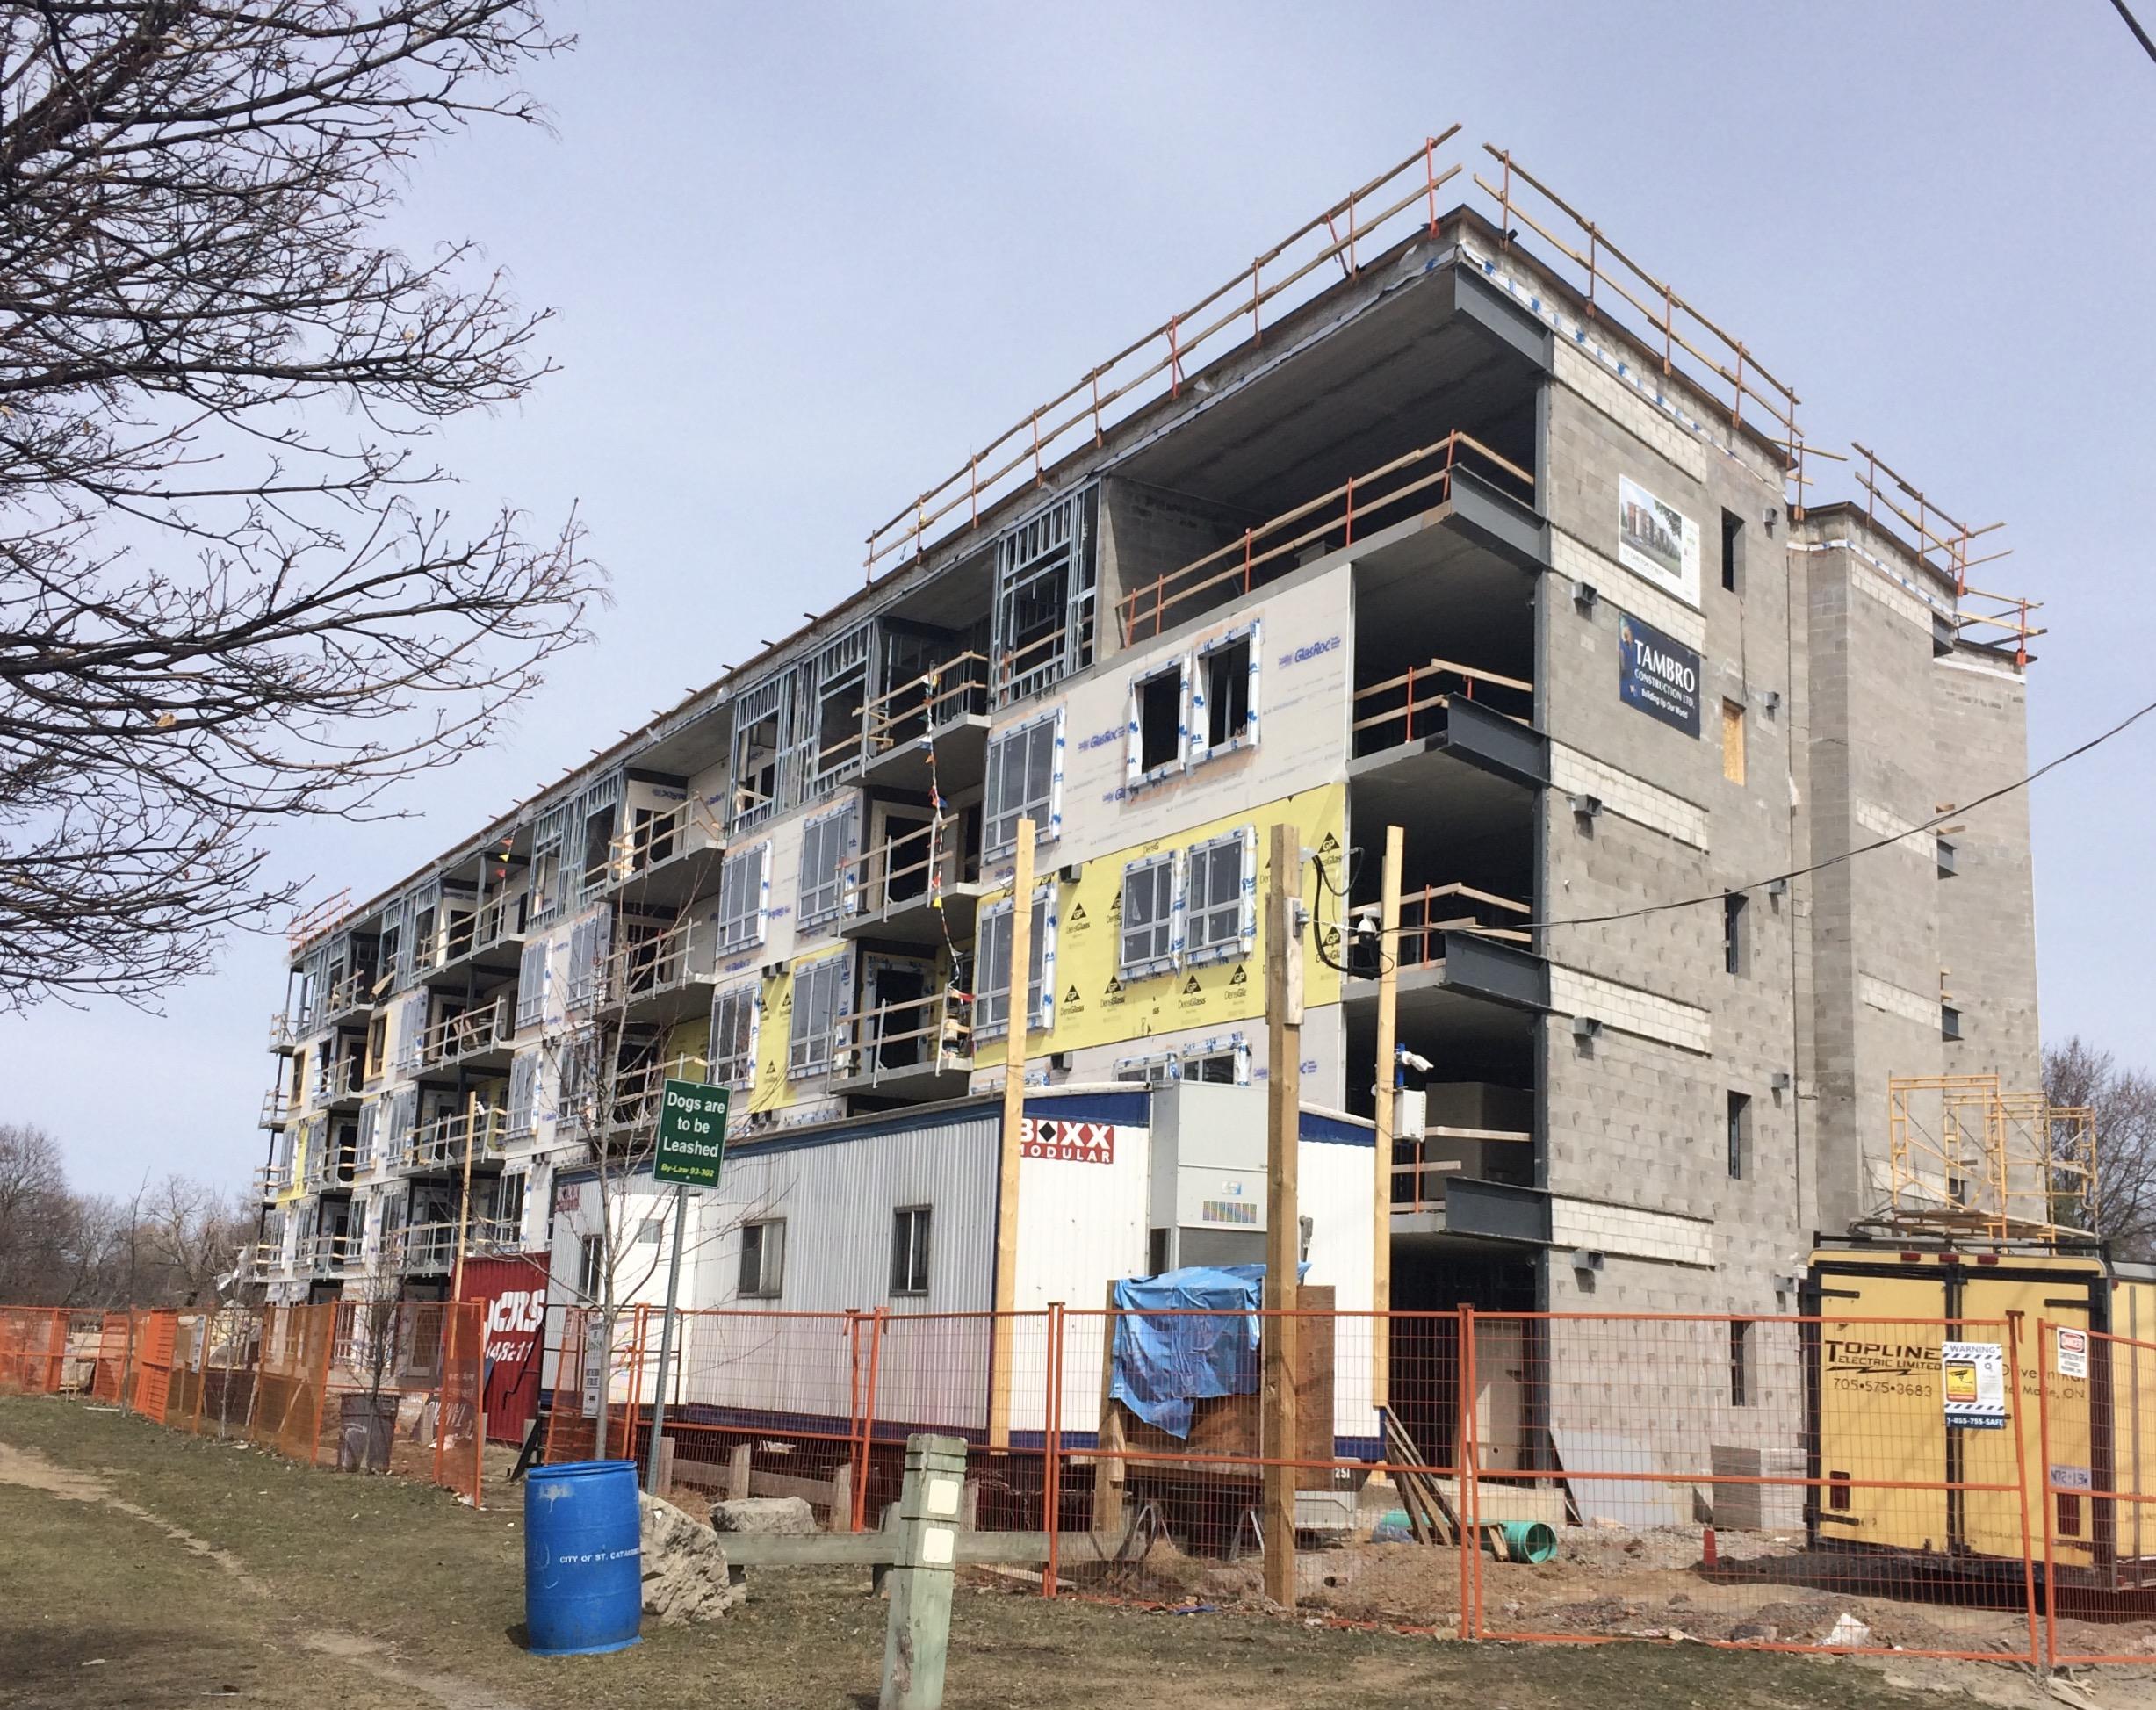 Niagara Regional Housing Carlton St. construction